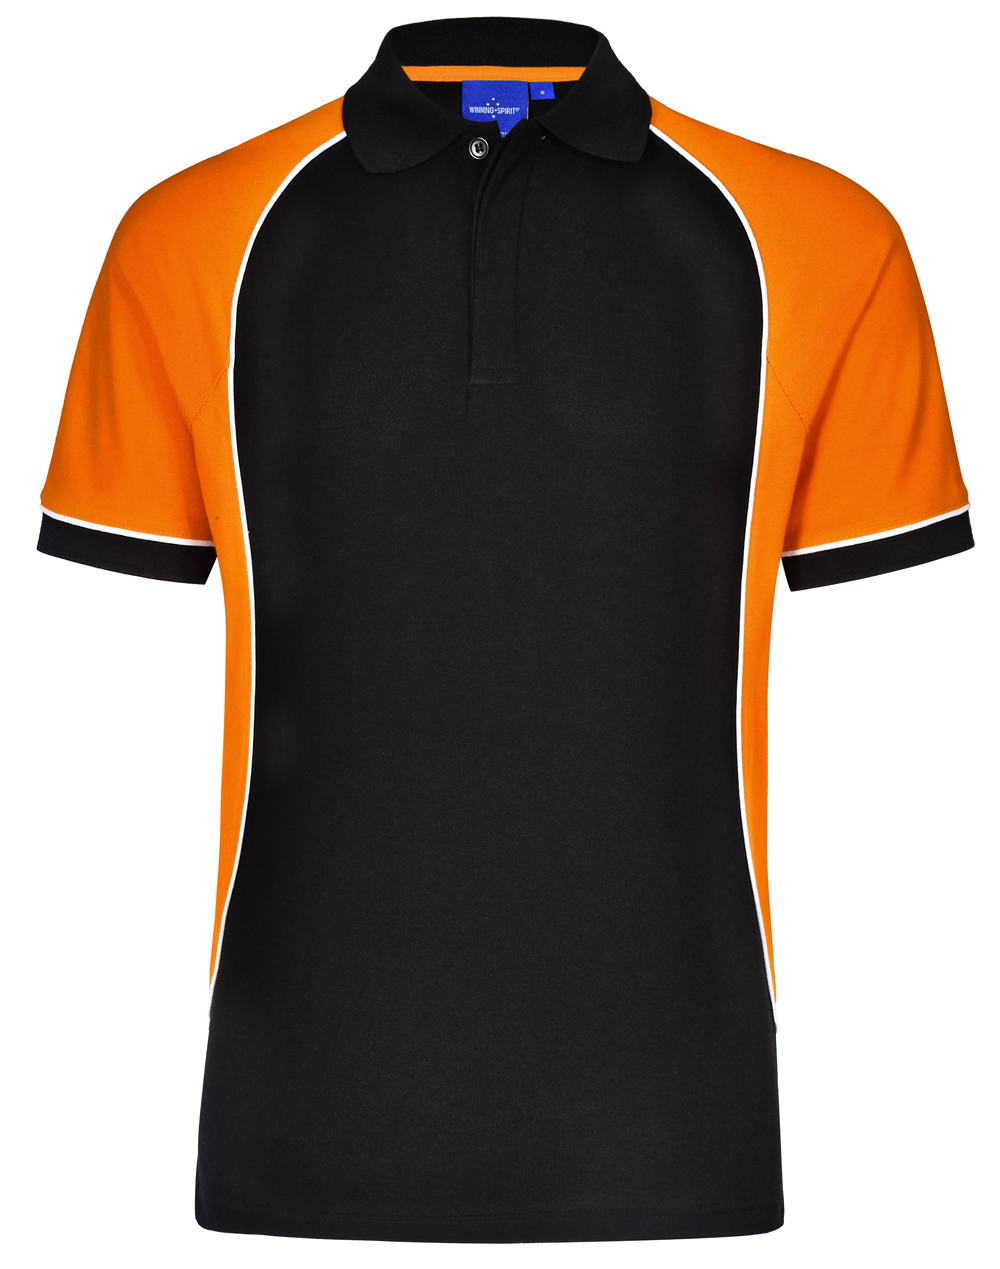 Black.White.Orange